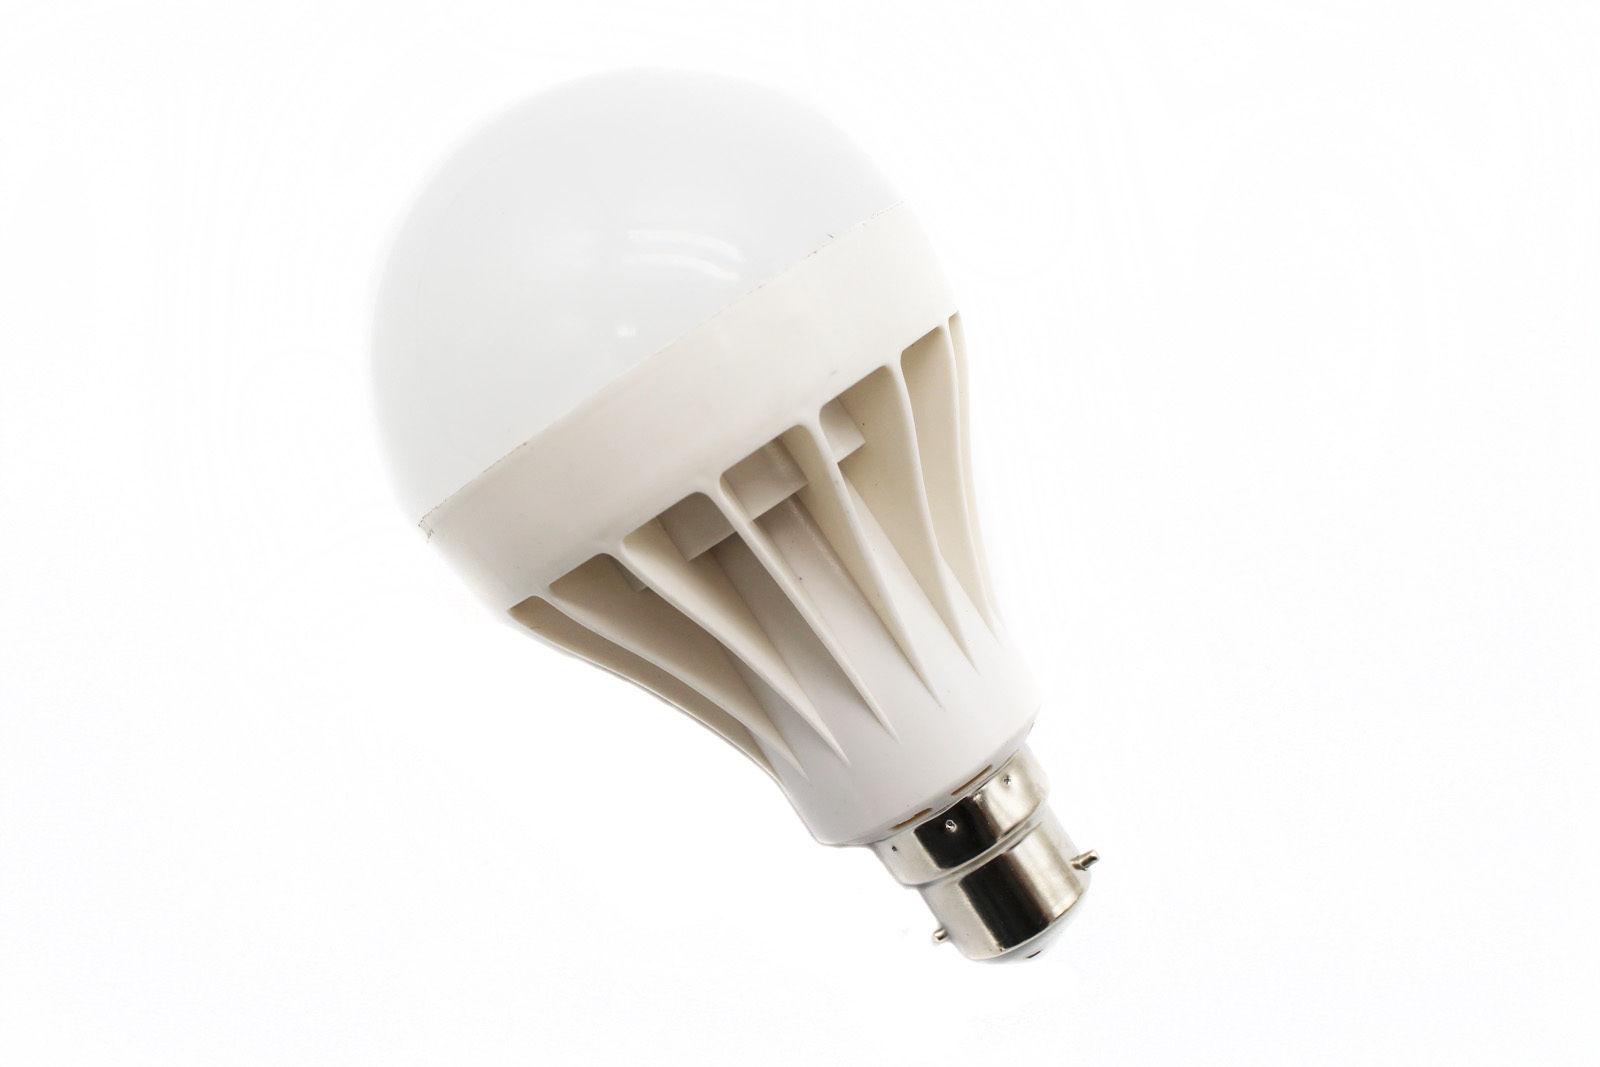 LED B22 Energy Saving Bulb Light 3W  Globe Lamp  220V Warm White